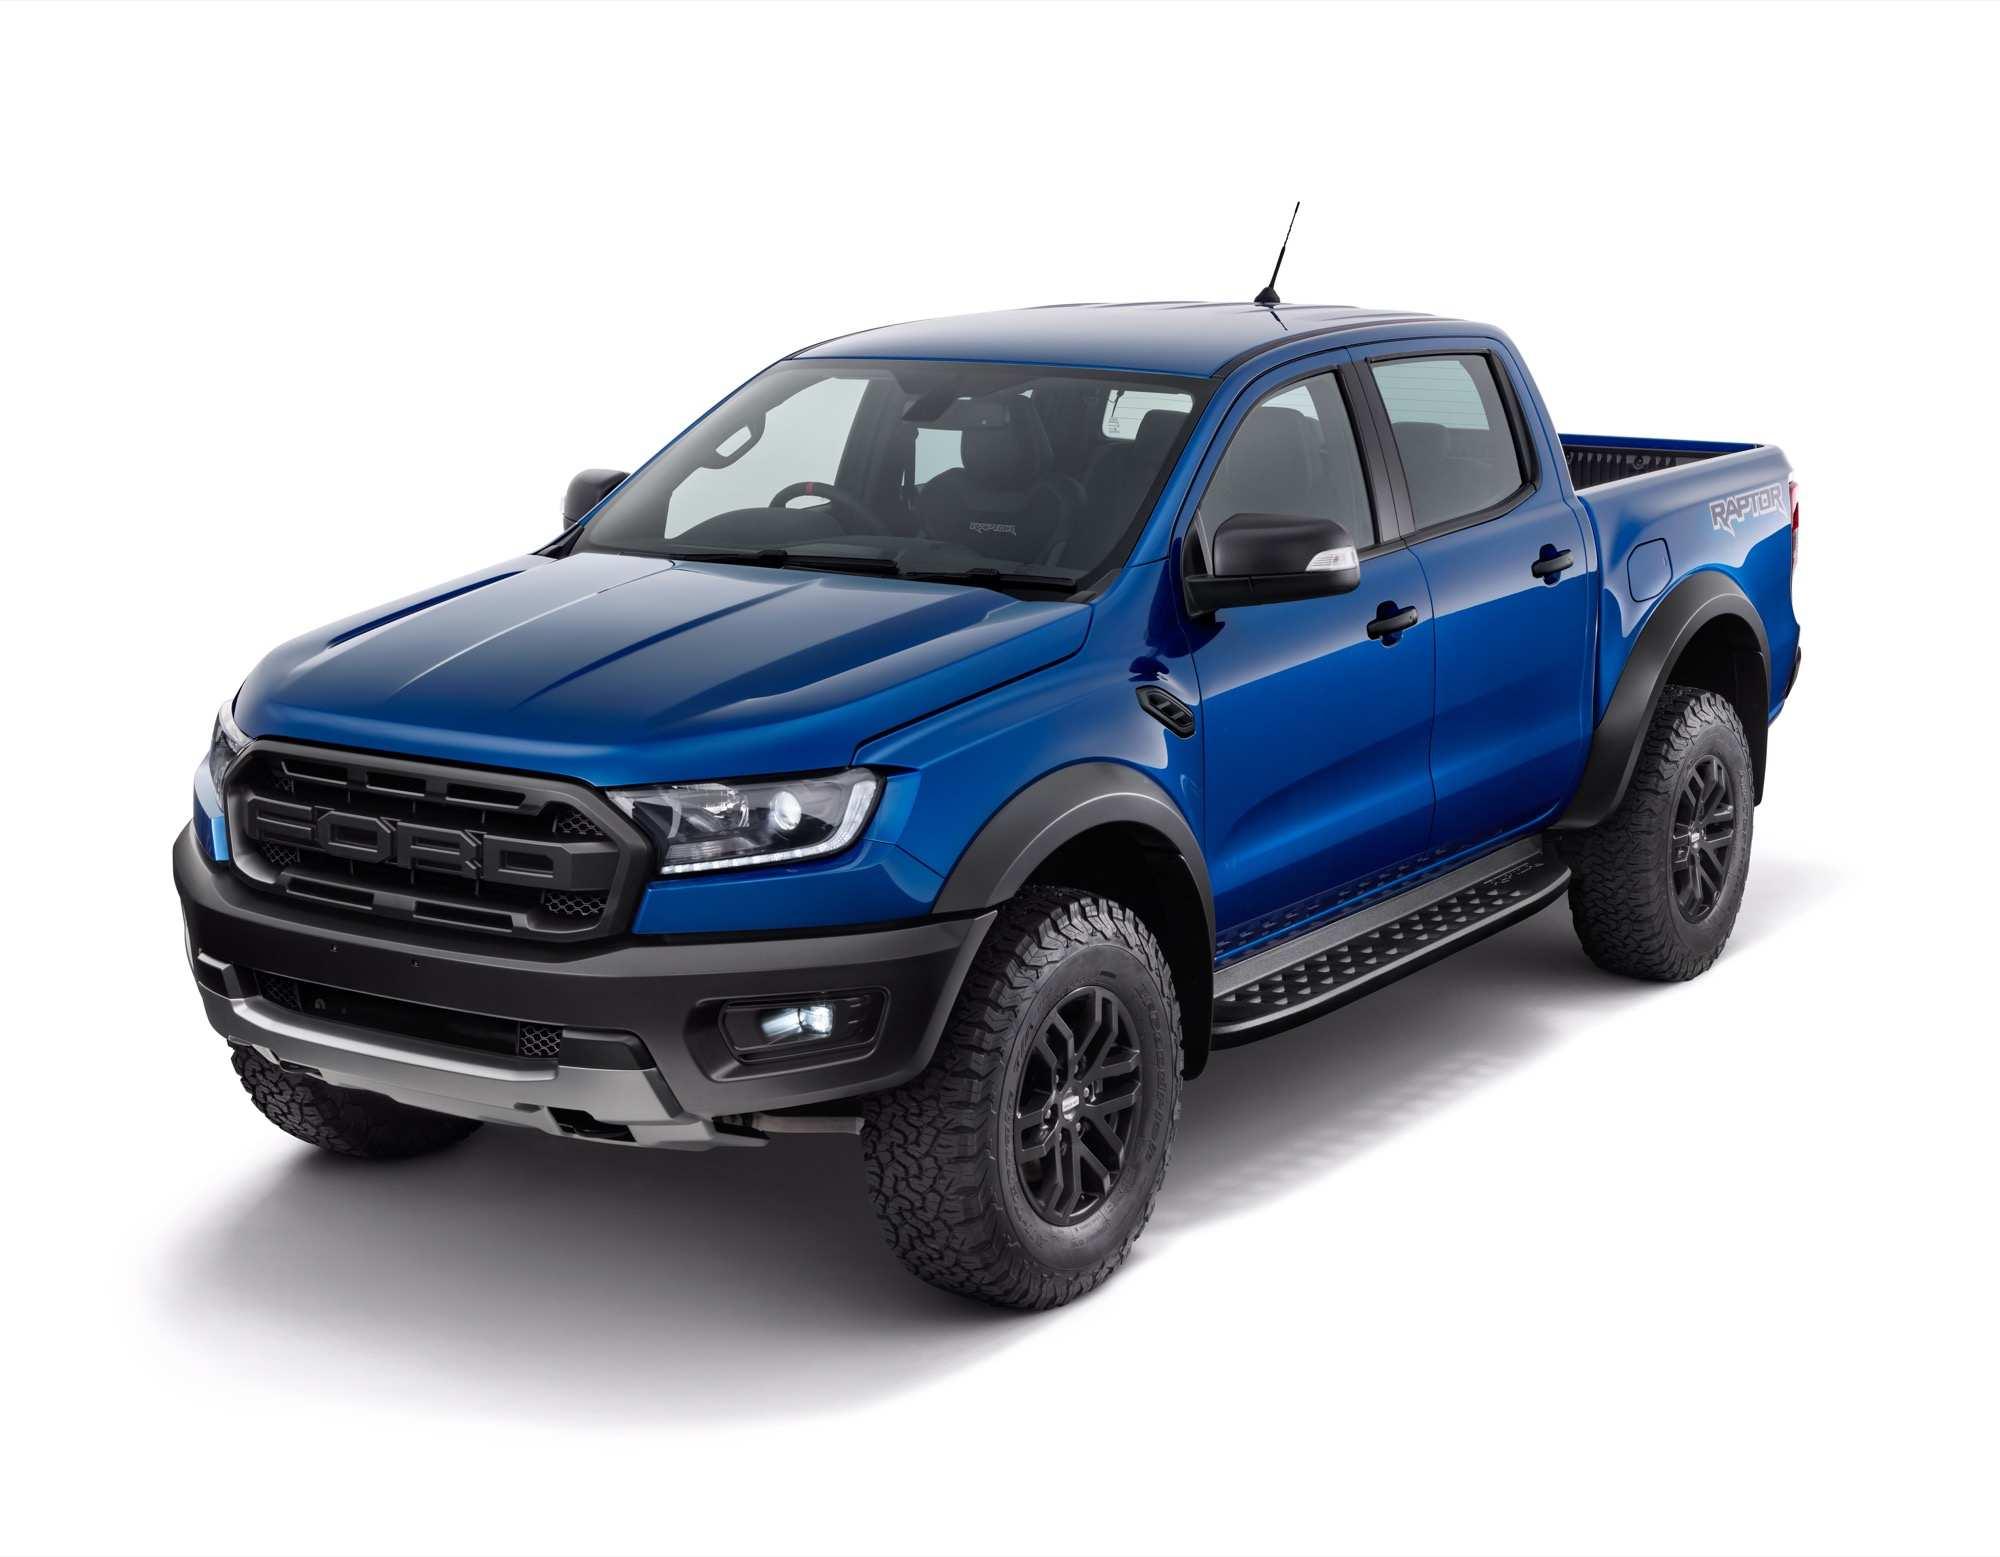 87 Gallery of The New Ford 2019 Ranger Rumor New Review with The New Ford 2019 Ranger Rumor